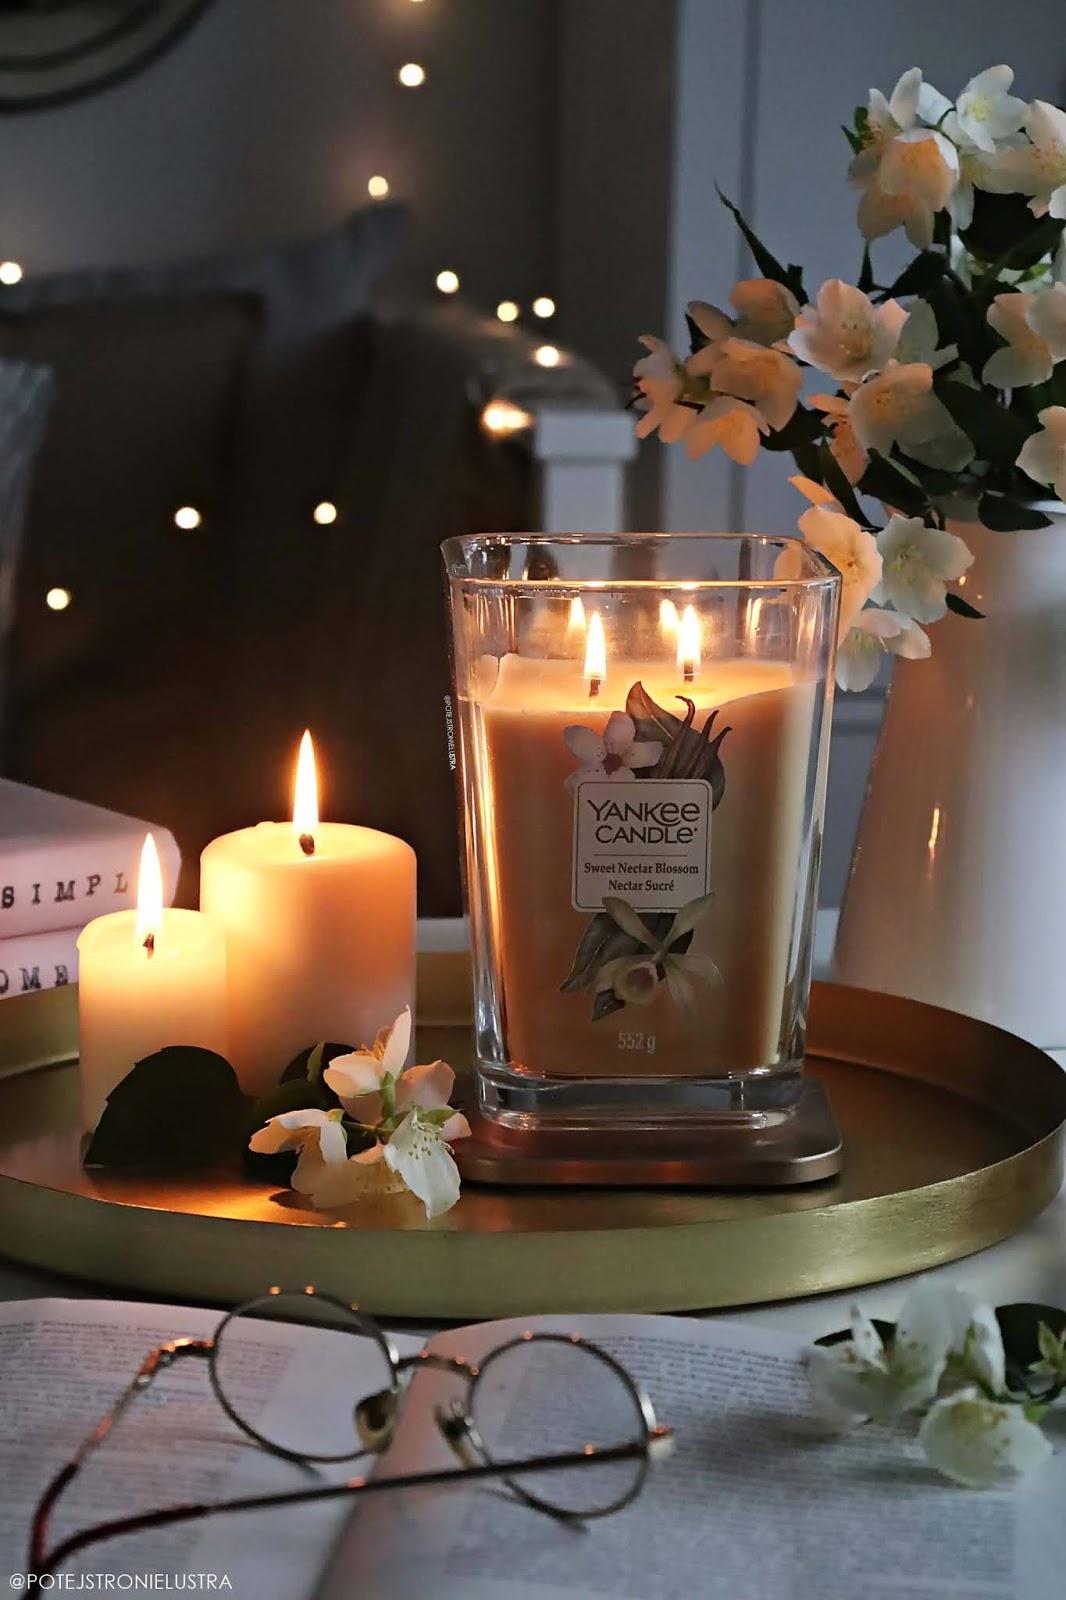 yankee candle sweet nectar blossom świeca zapachowa